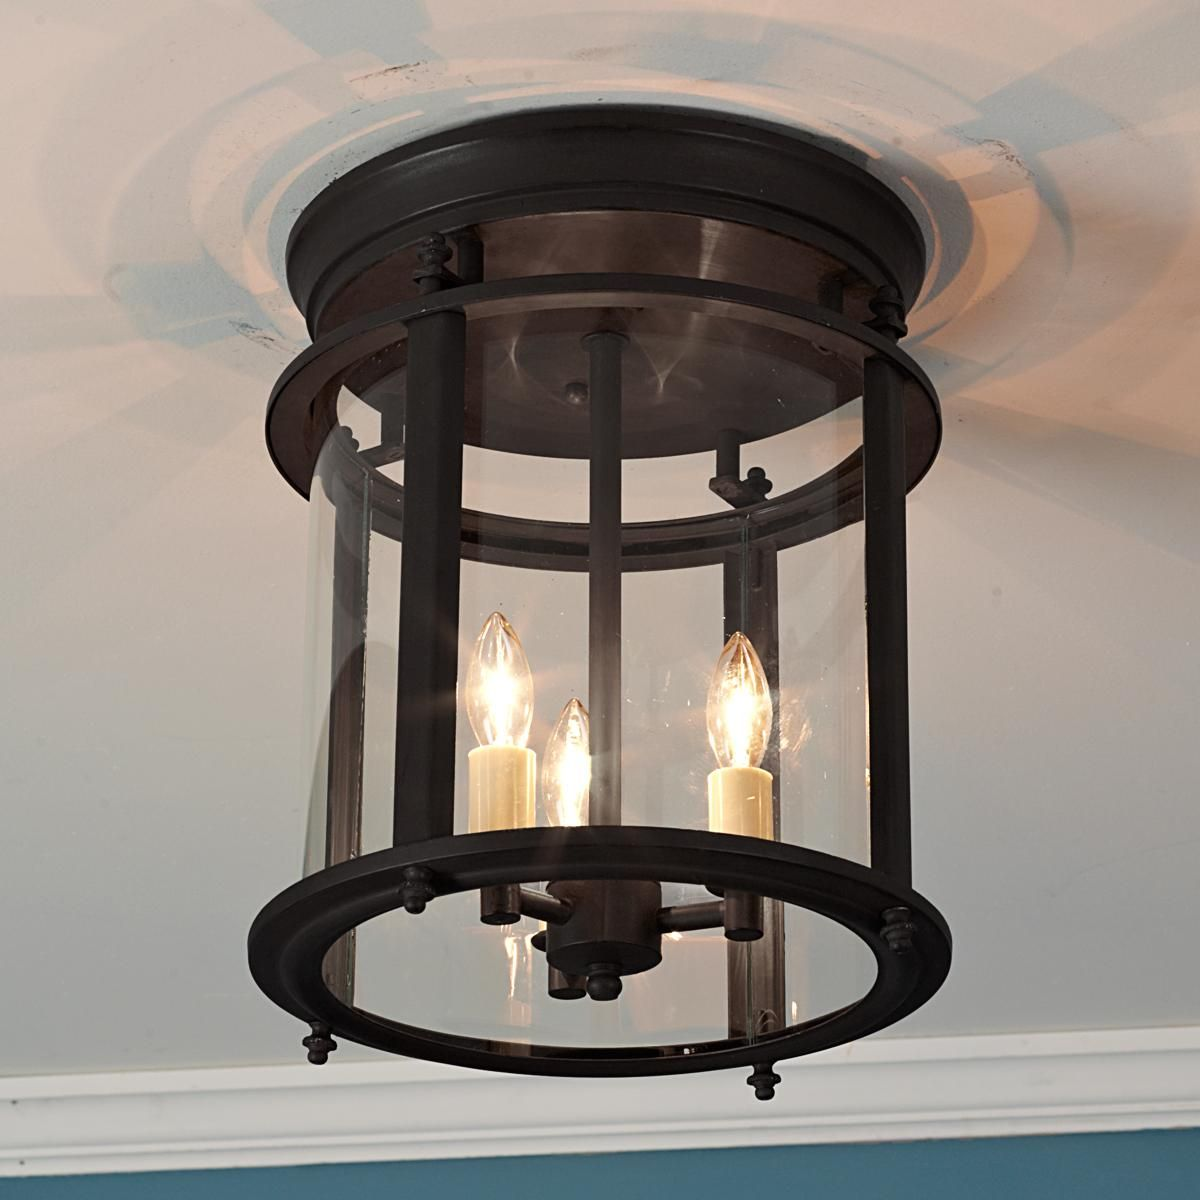 Classic Ceiling Lantern - Large